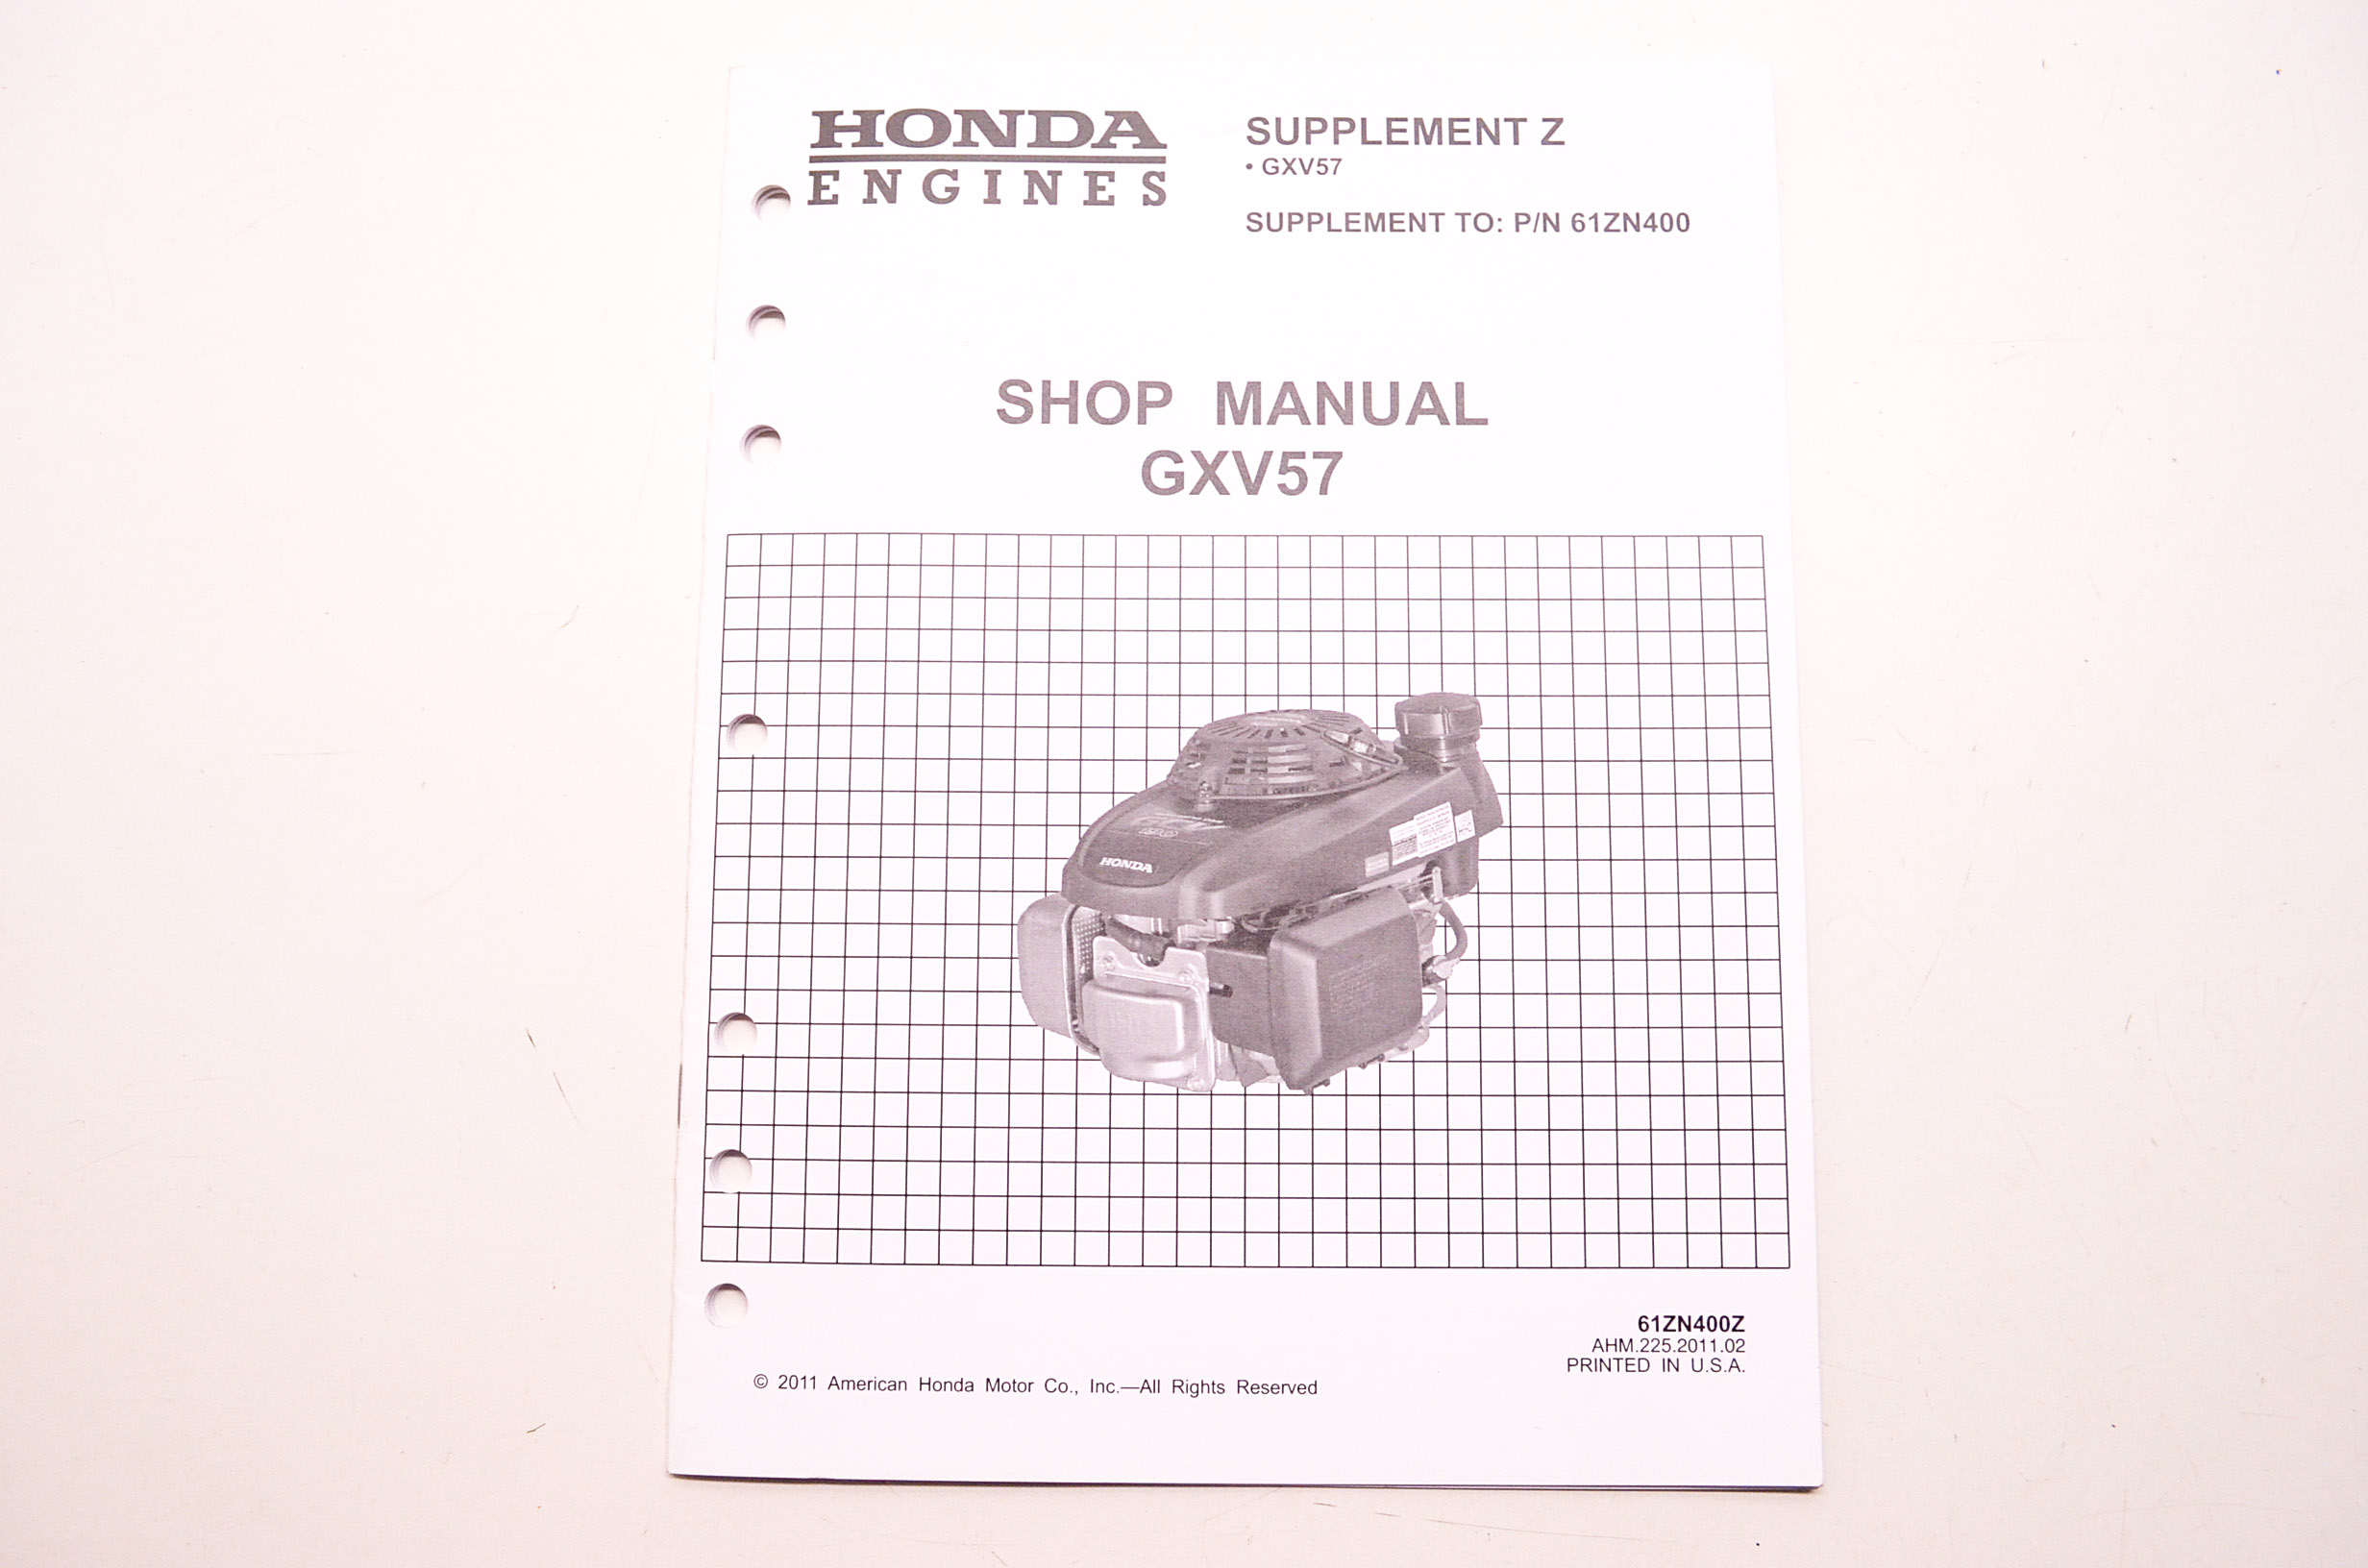 ahm 560 manual